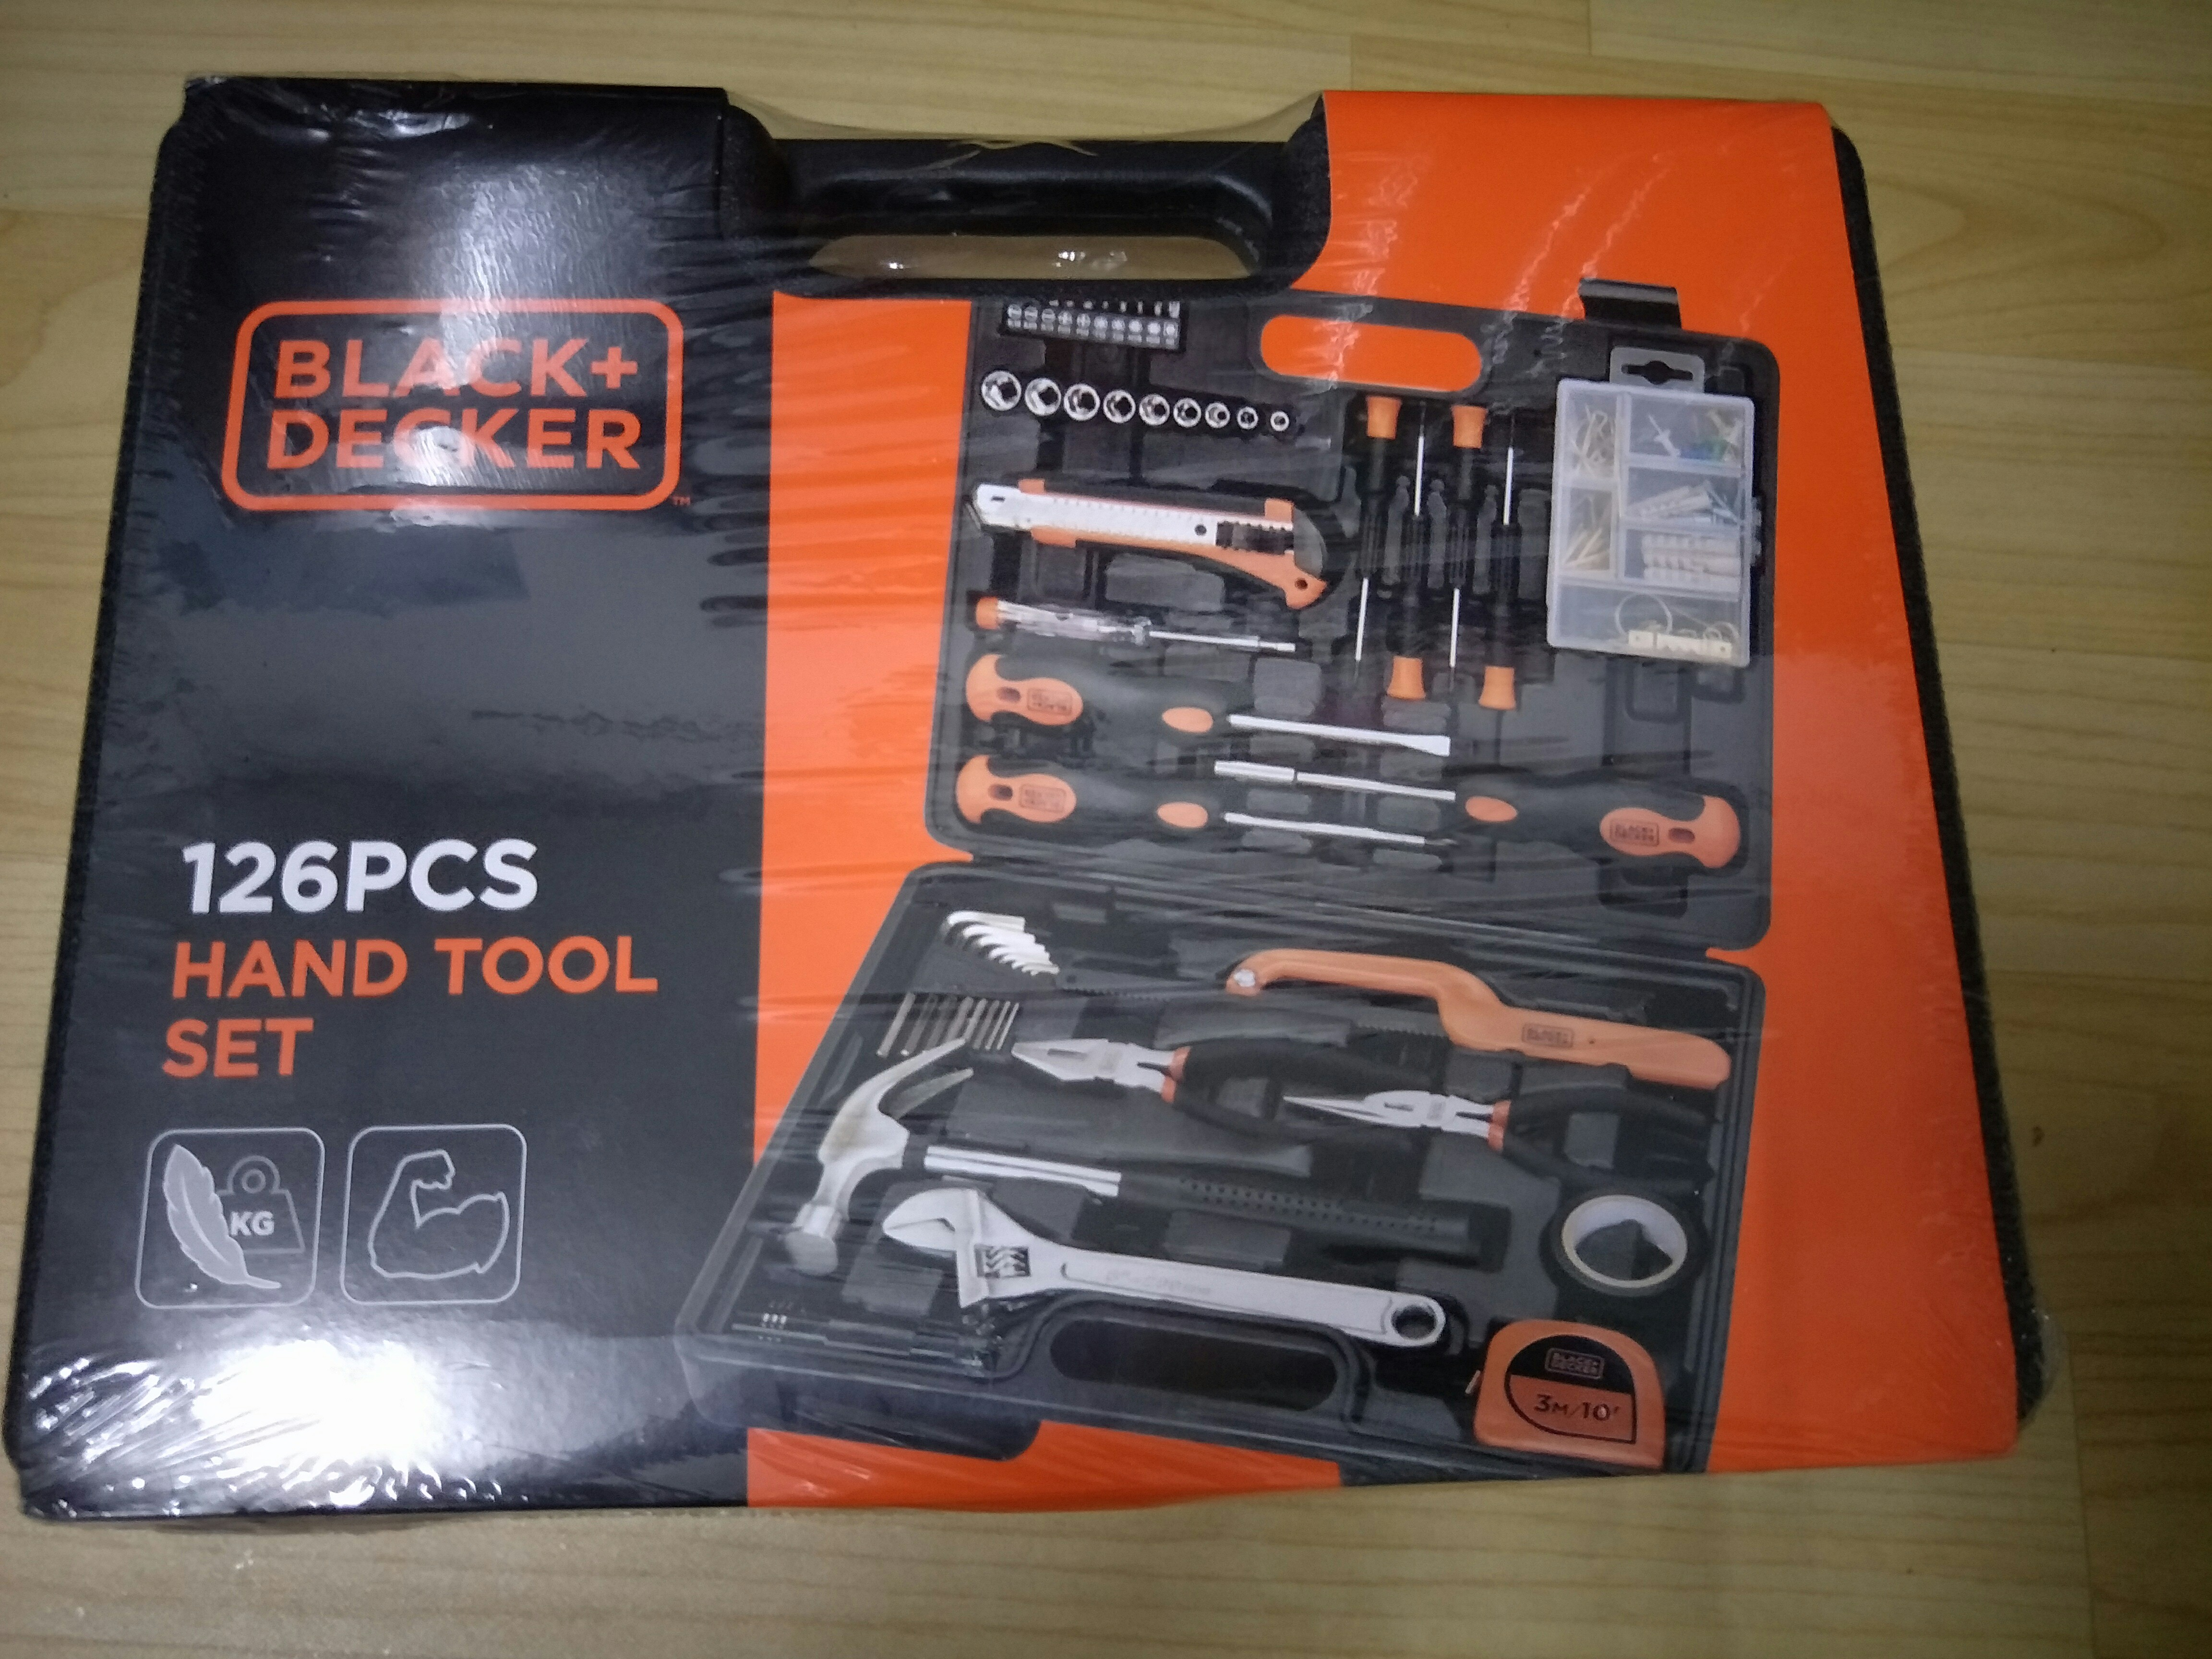 Black+Decker 126pcs Hand Tool Set, Everything Else on Carousell